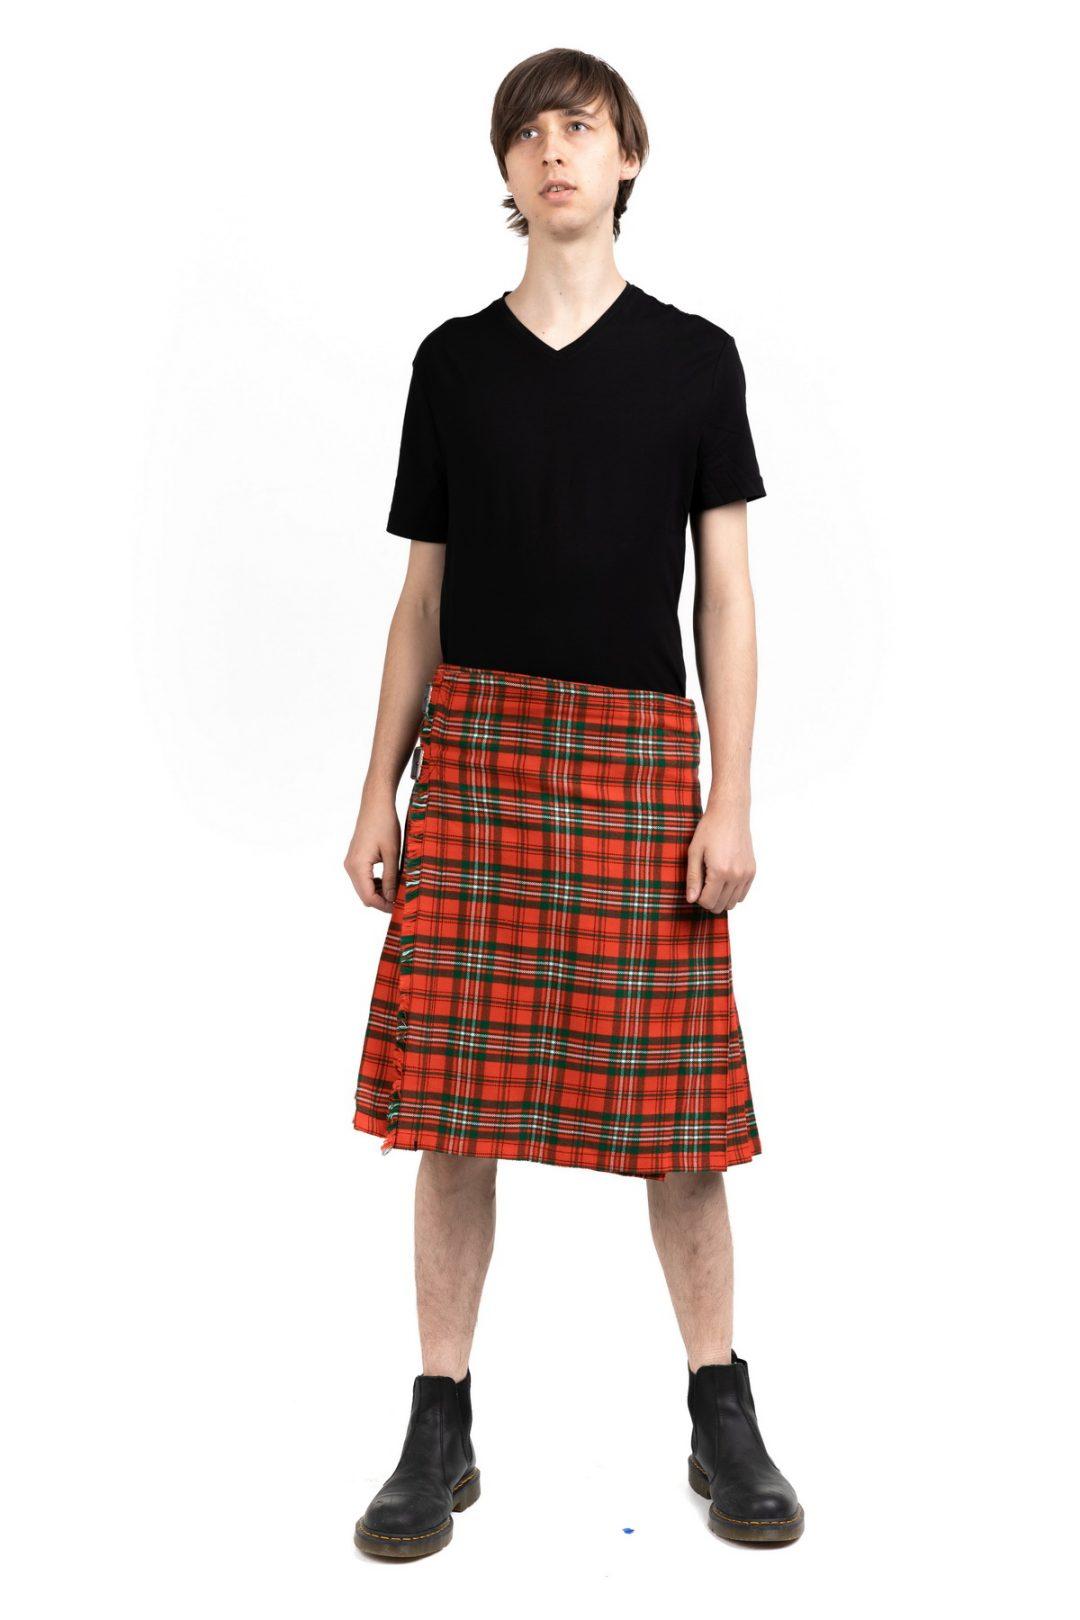 Scott Tartan Kilt and Outfit